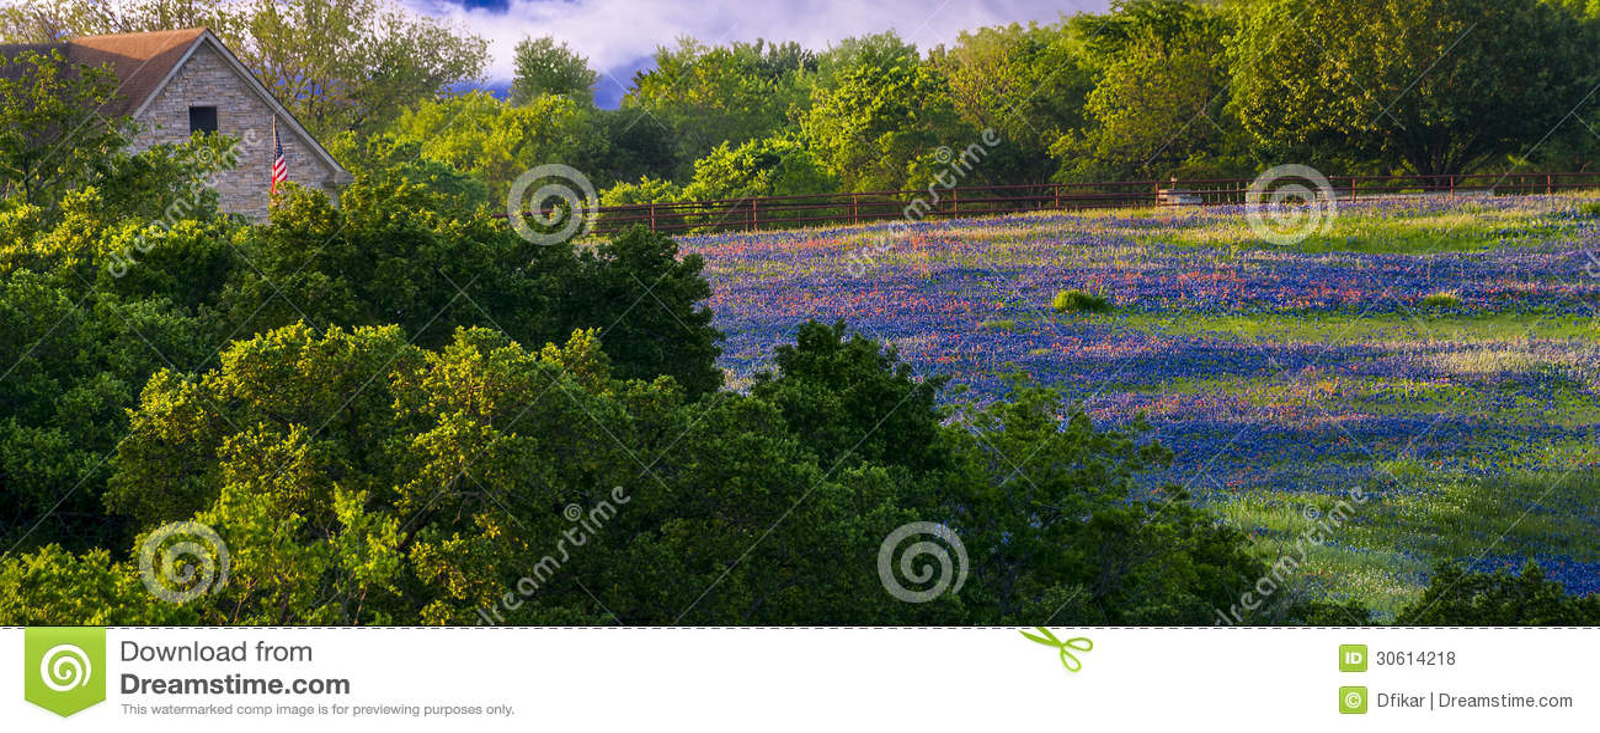 Wildflowers on Sugar Ridge Road